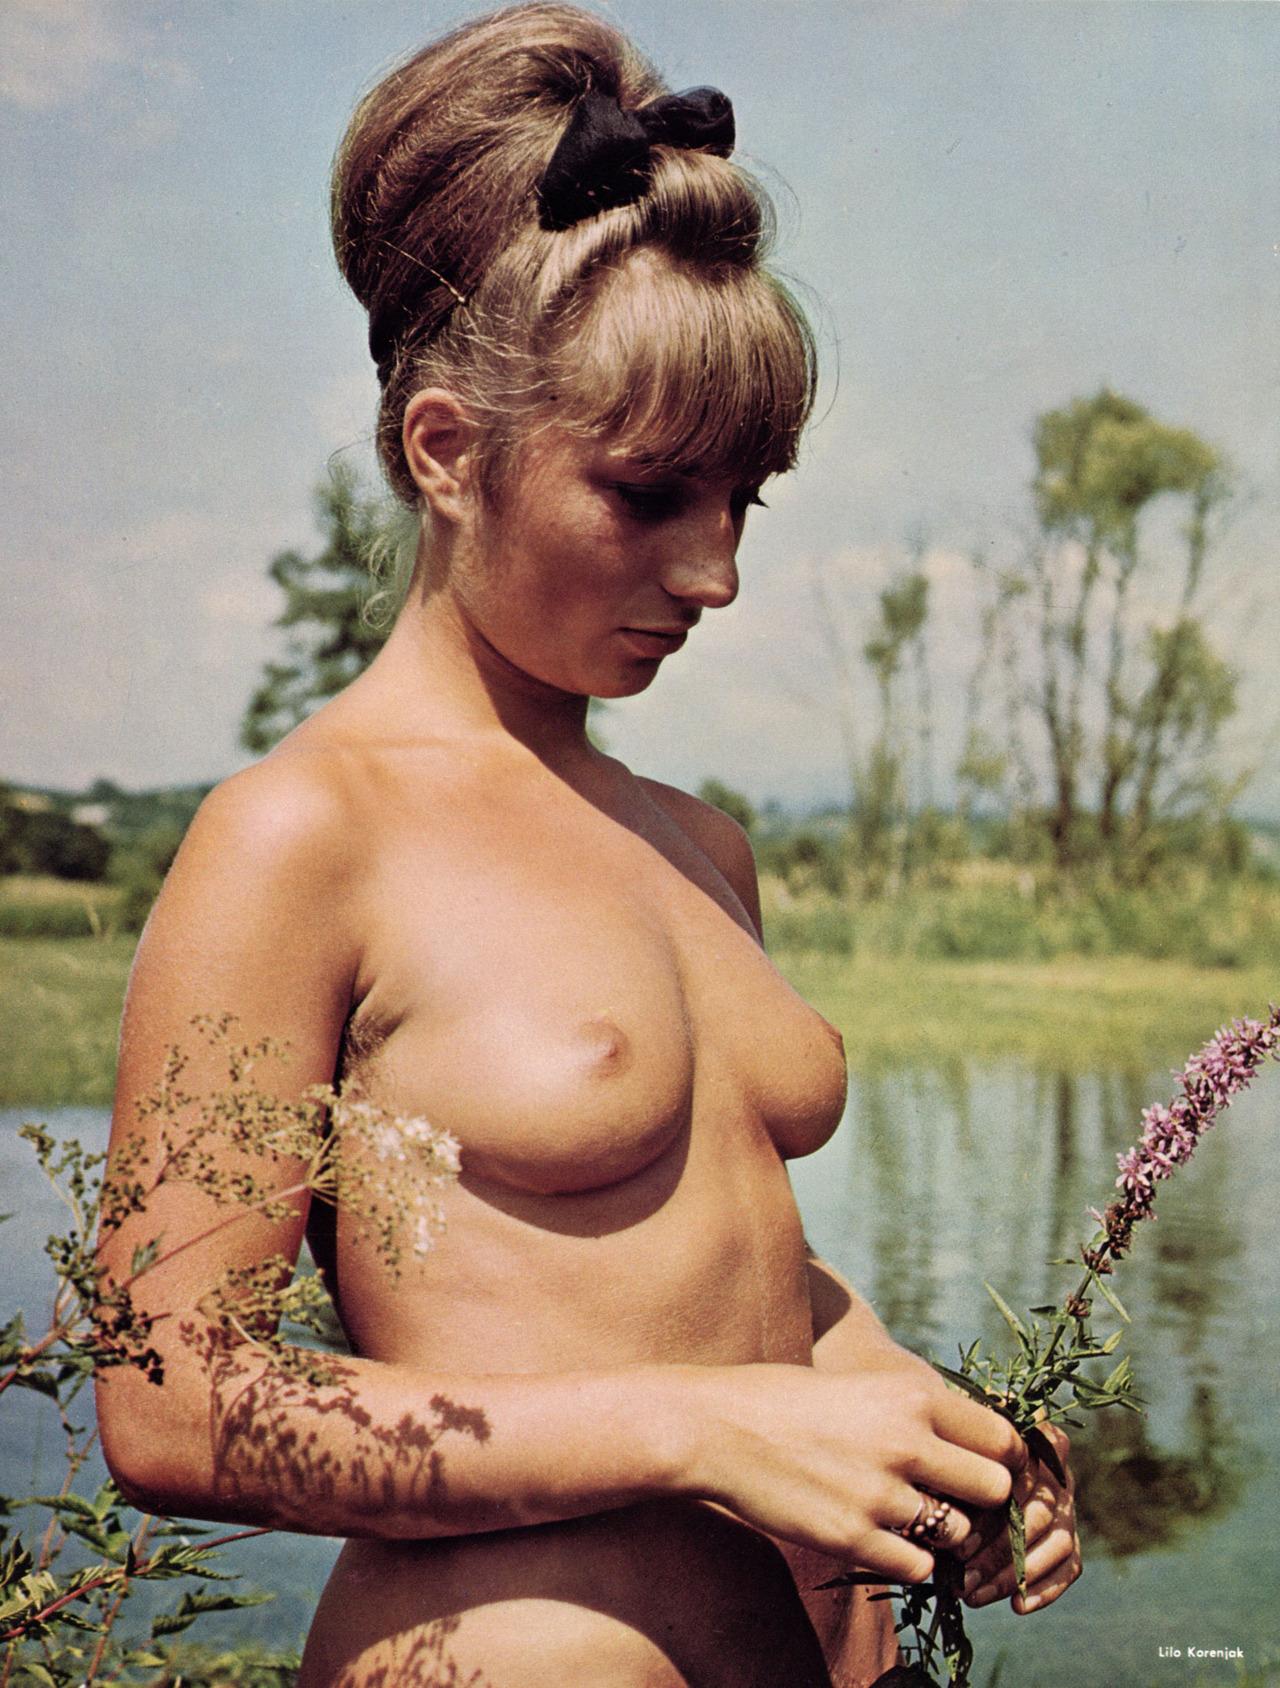 https://www.nudismlife.com/galleries/nudists_and_nude/the_most_natural_nudists/the_most_natural_nudists_0118.jpg